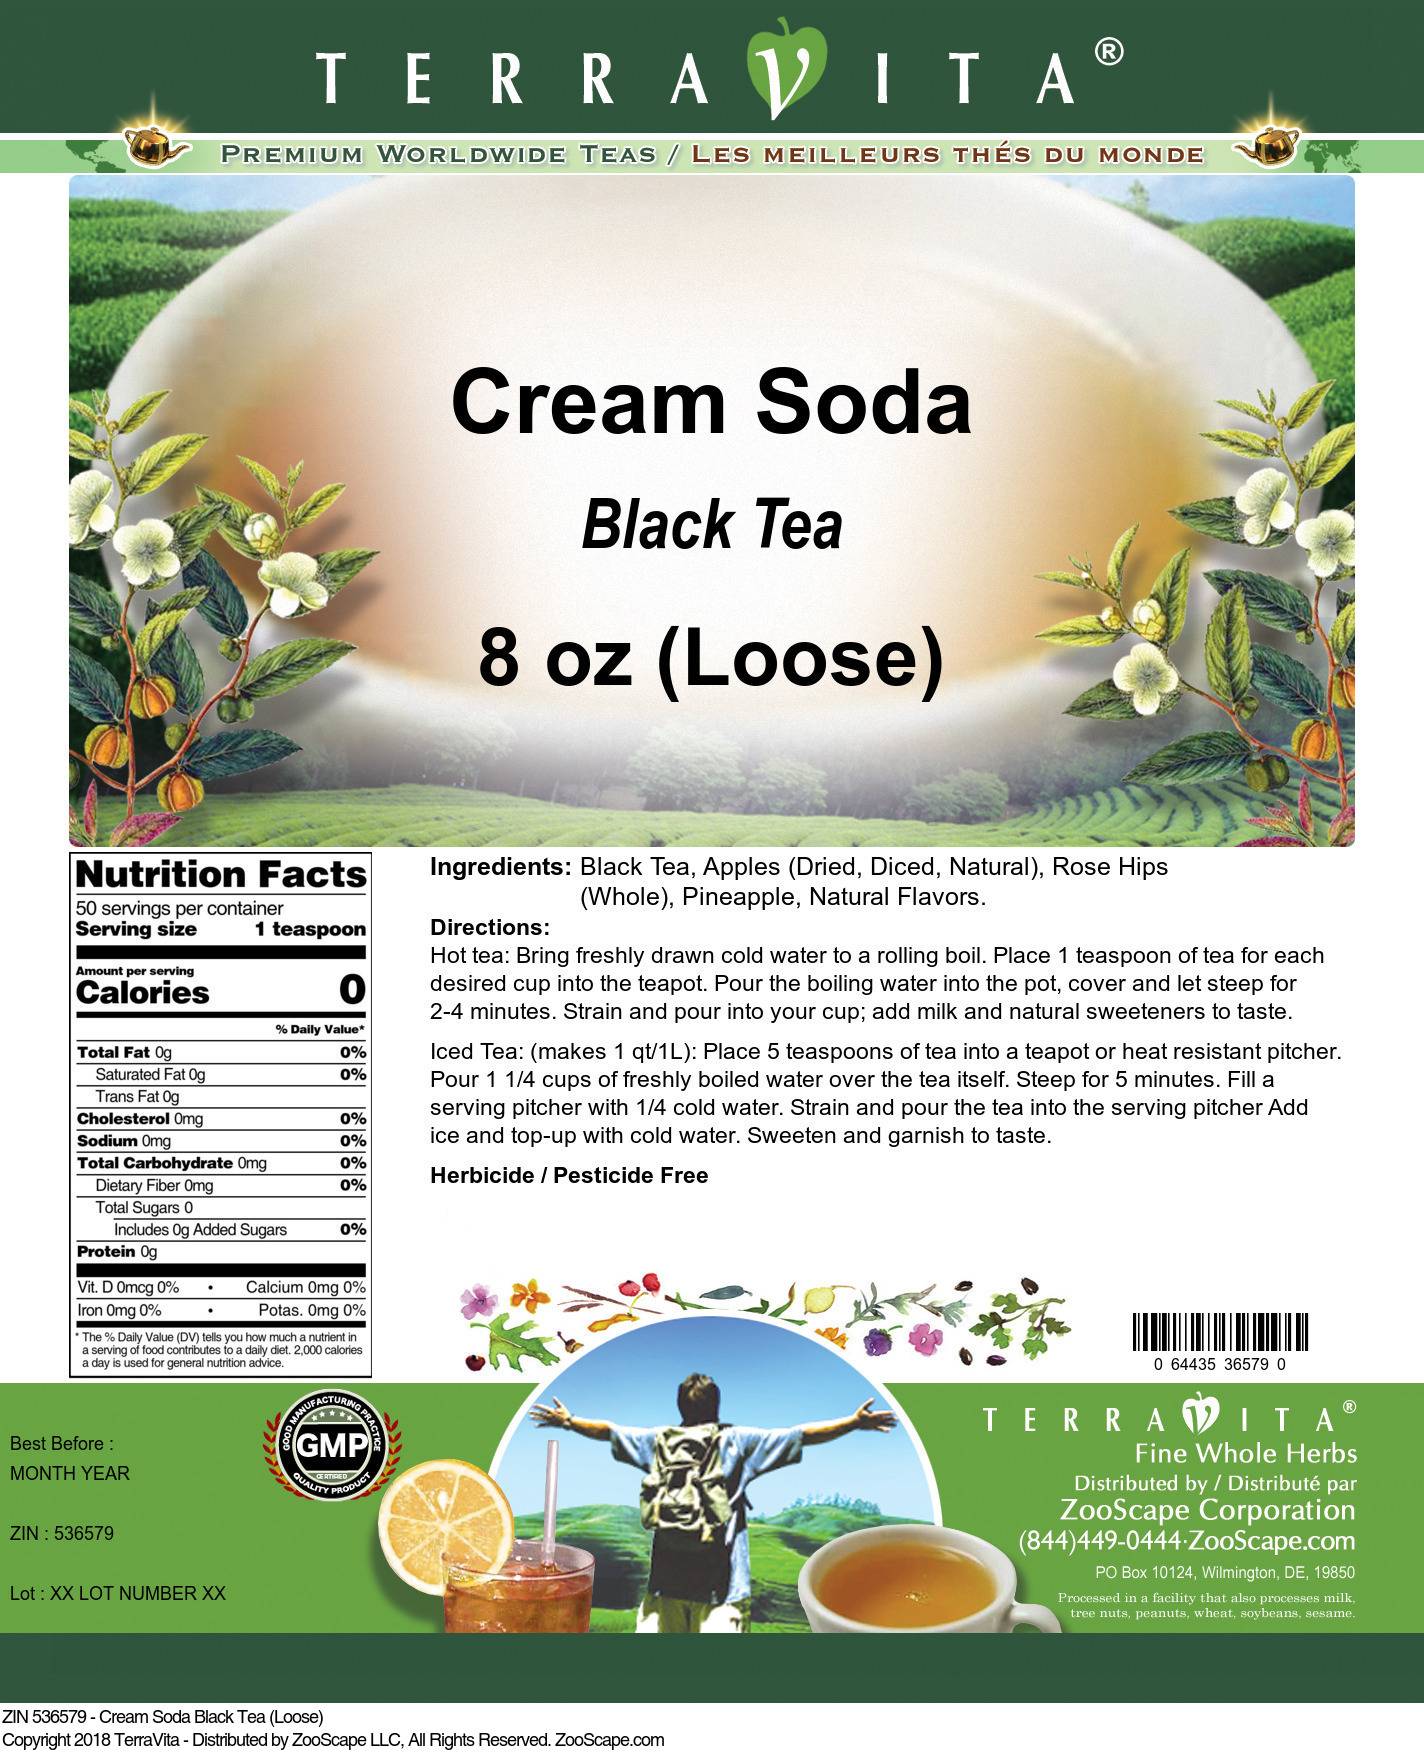 Cream Soda Black Tea (Loose)